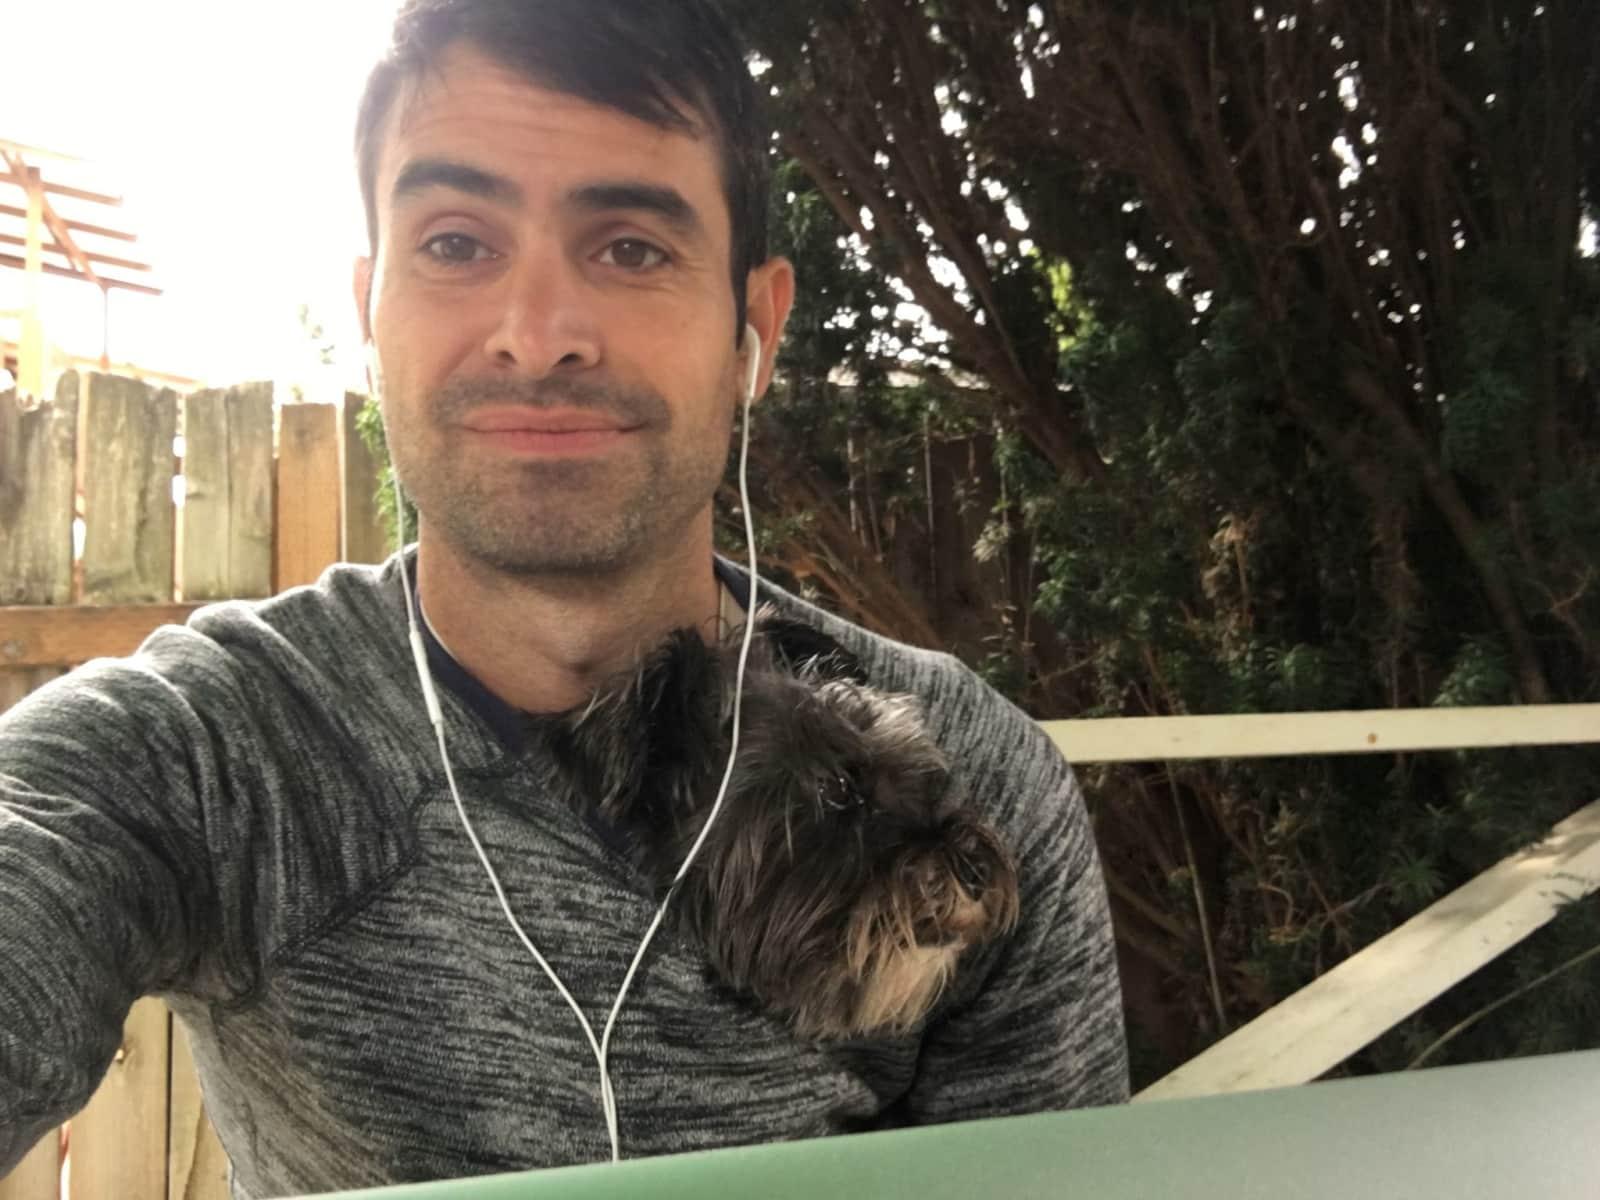 Dan from Portland, Oregon, United States